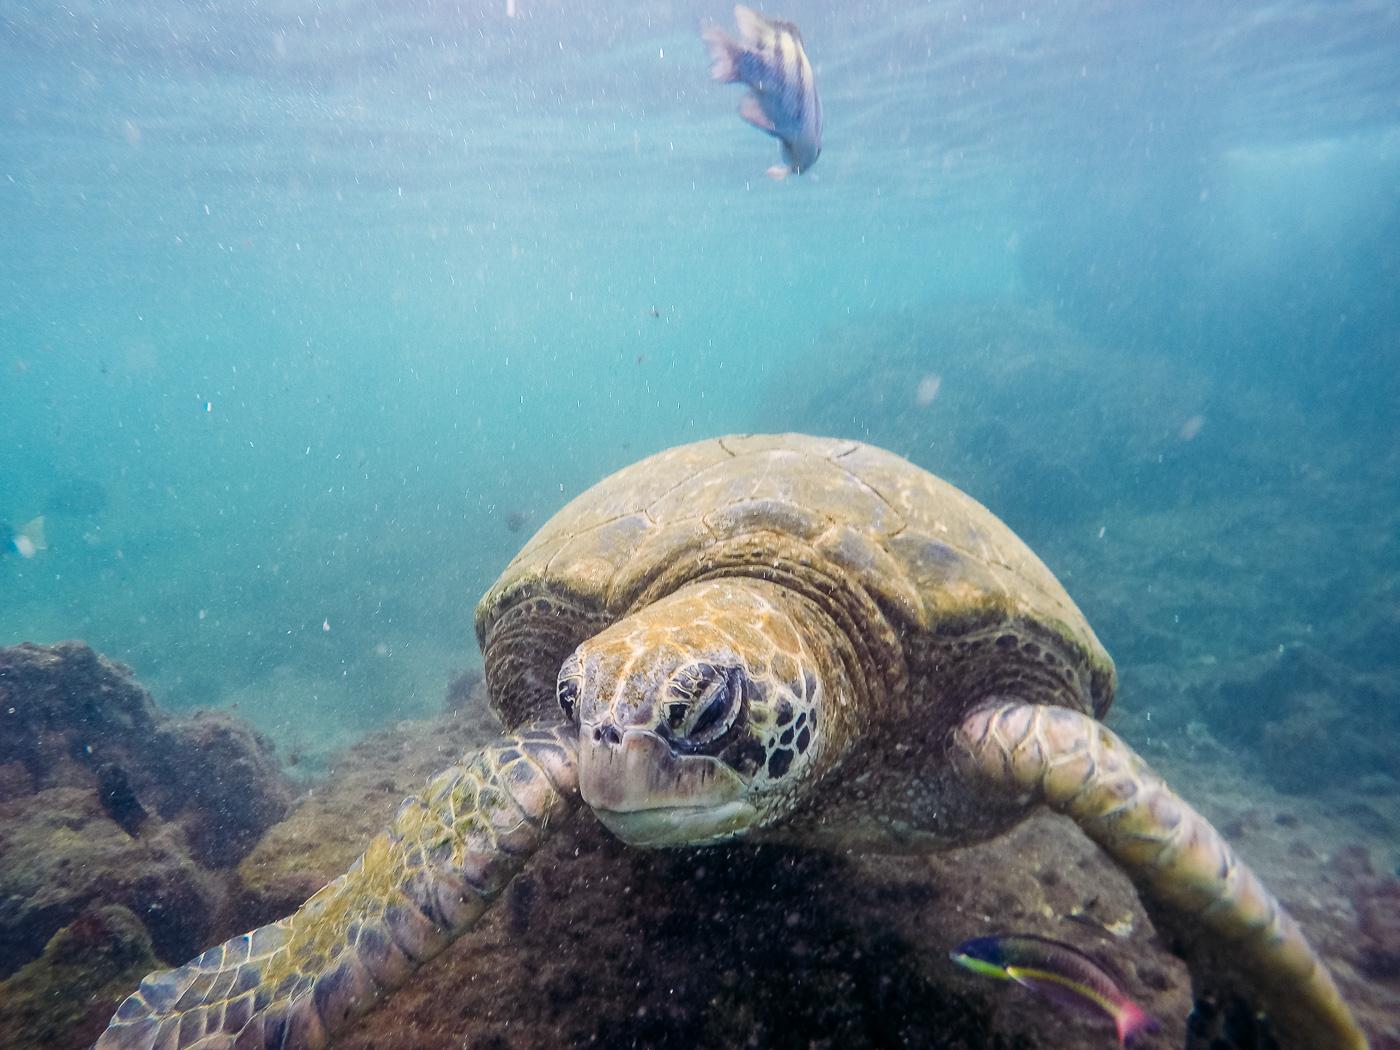 Sea Turtles, Los Tuneles, Peurto Vilamil, Isla Isabela, Galapagos